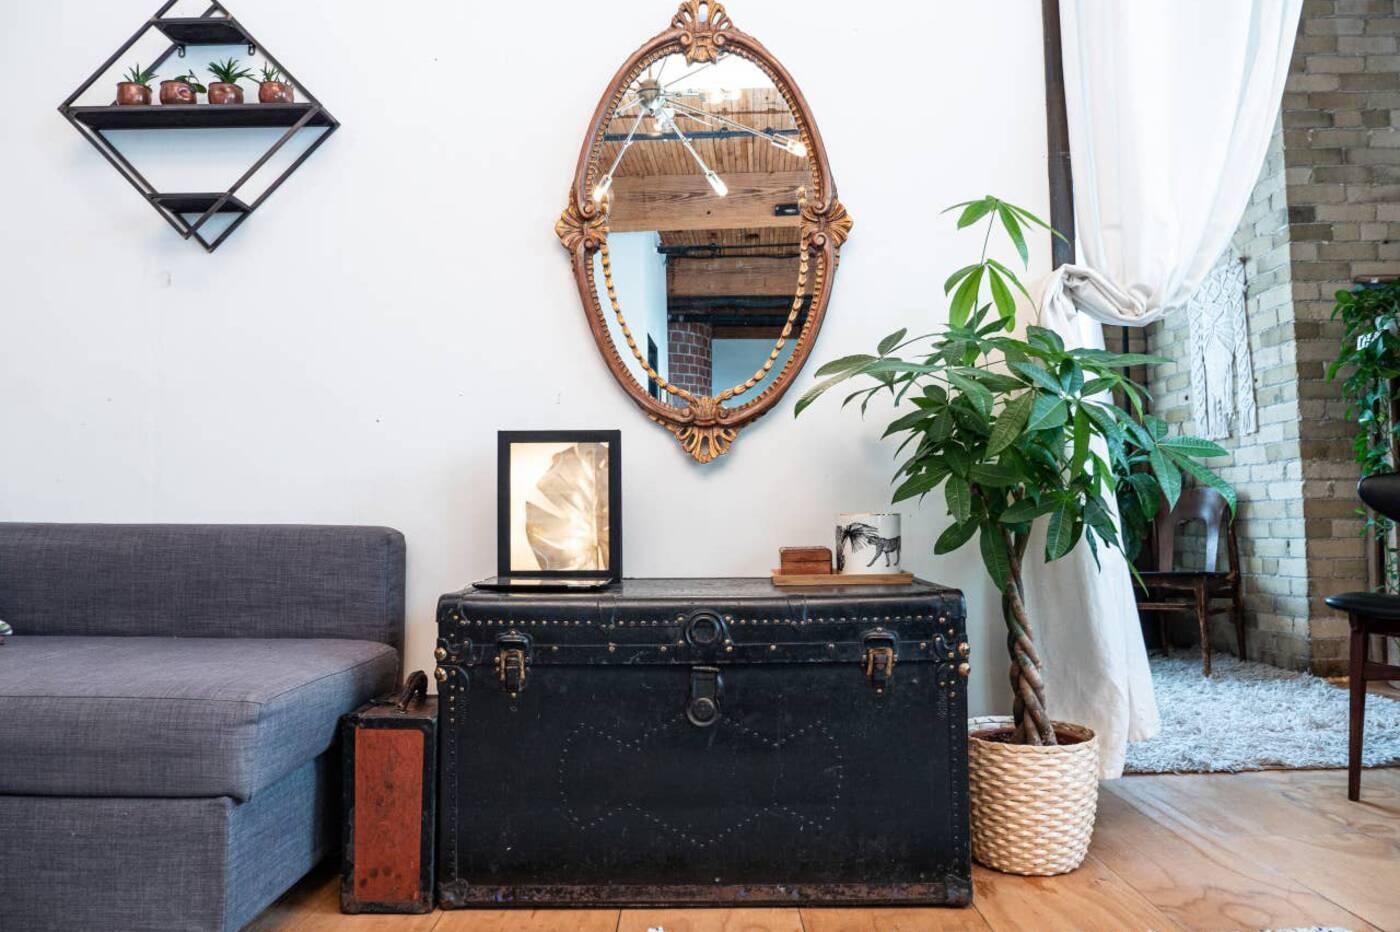 airbnb toronto